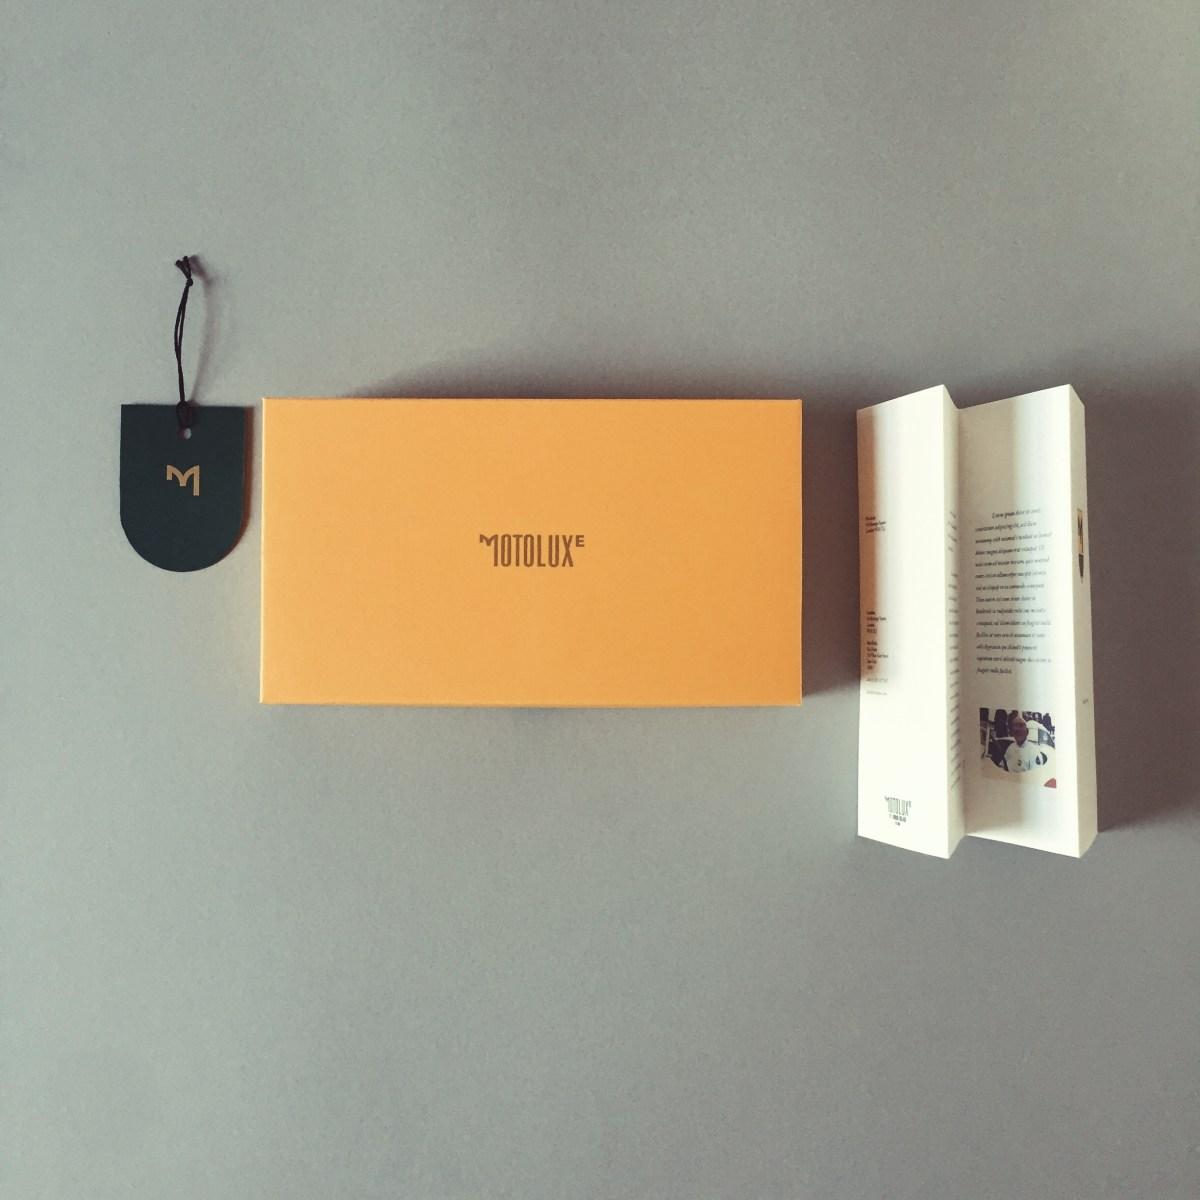 New Work — Coming Soon.Motoluxe.#Brand #Branding #Design #Graphicdesign #Fashion #Luxury #Mensfashion #packagingdesign #packaging #Menswear #Coat #British #Driving #Classic #Classiccar #Classiccars #Gentleman #Motoluxe #TeddyBearCoat #NewRelease #Menswear #MensStyle #Luxury #Outerwear #Style #Rakish #mayfair #london #graphicdesigner #graphicdesign #designagency #brandingagency